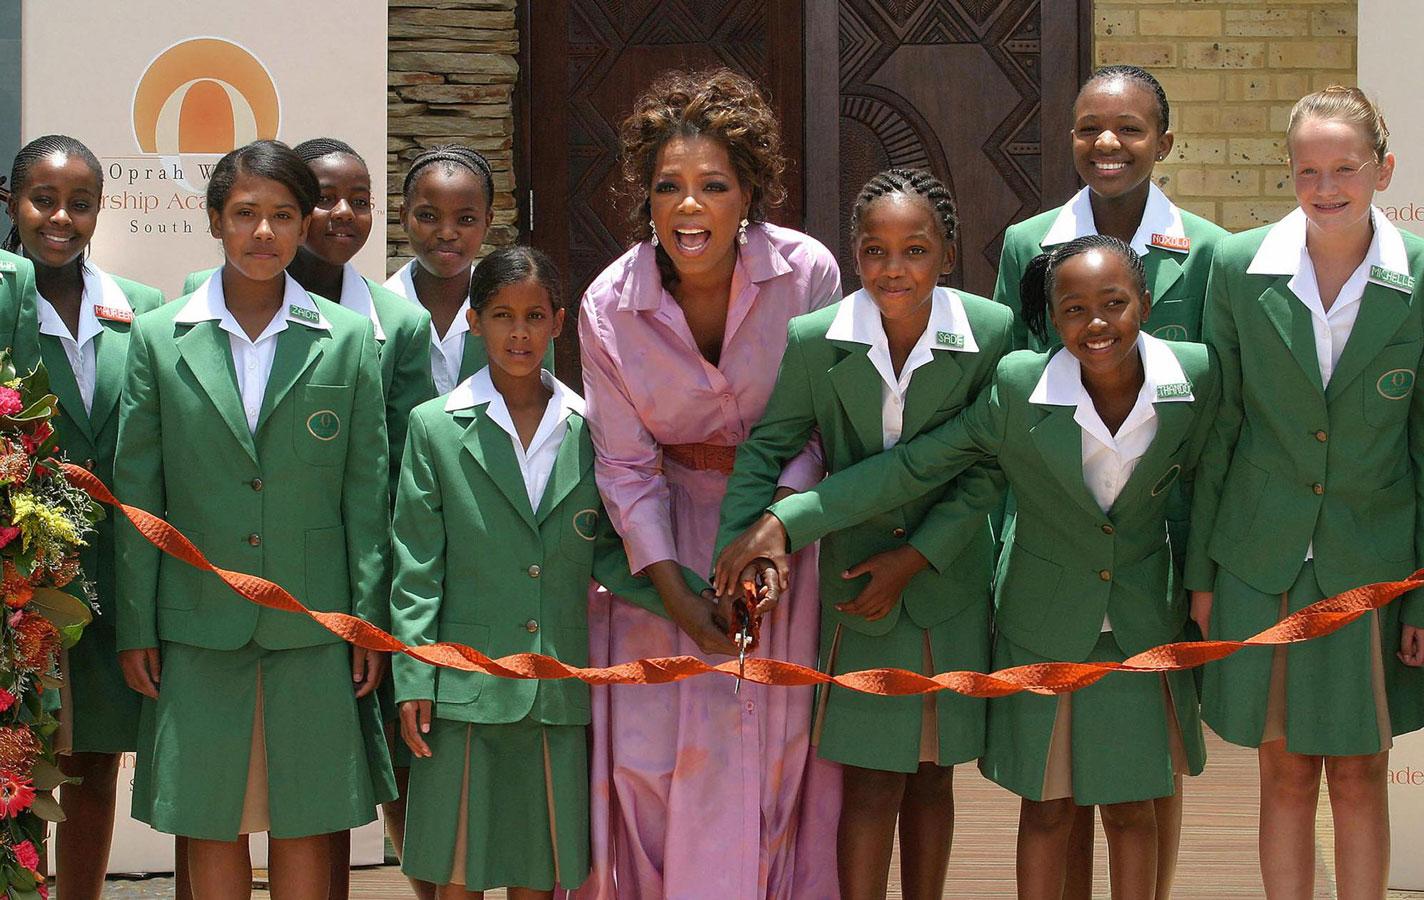 Опра Уинфри в Africa's Oprah Winfrey Leadership Academy for Girls